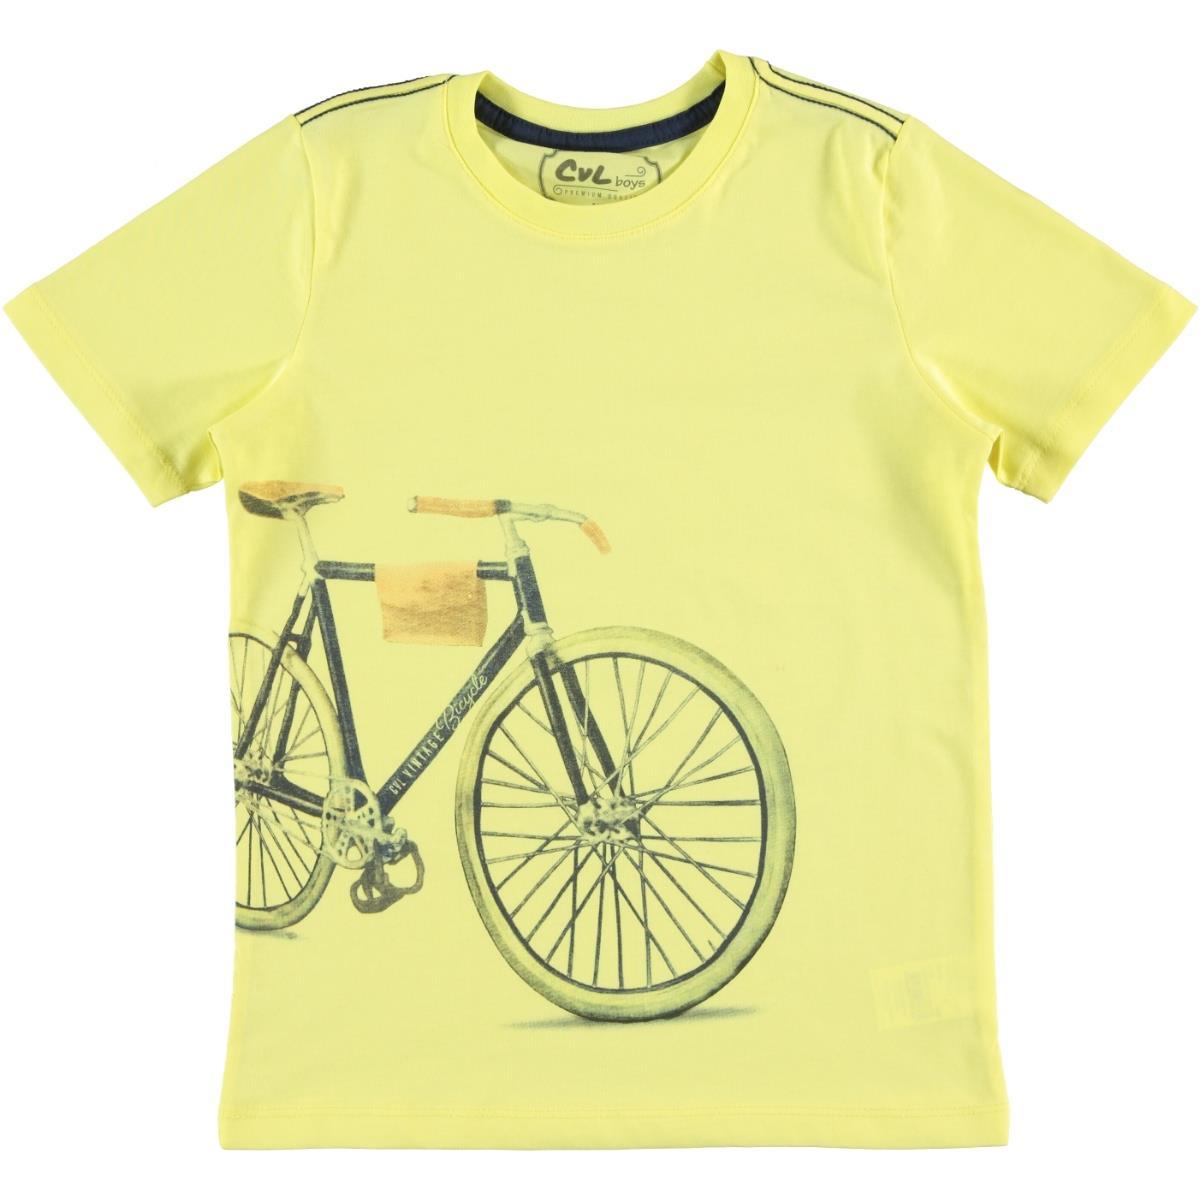 Cvl Boy T-Shirt Age 6-9 Yellow